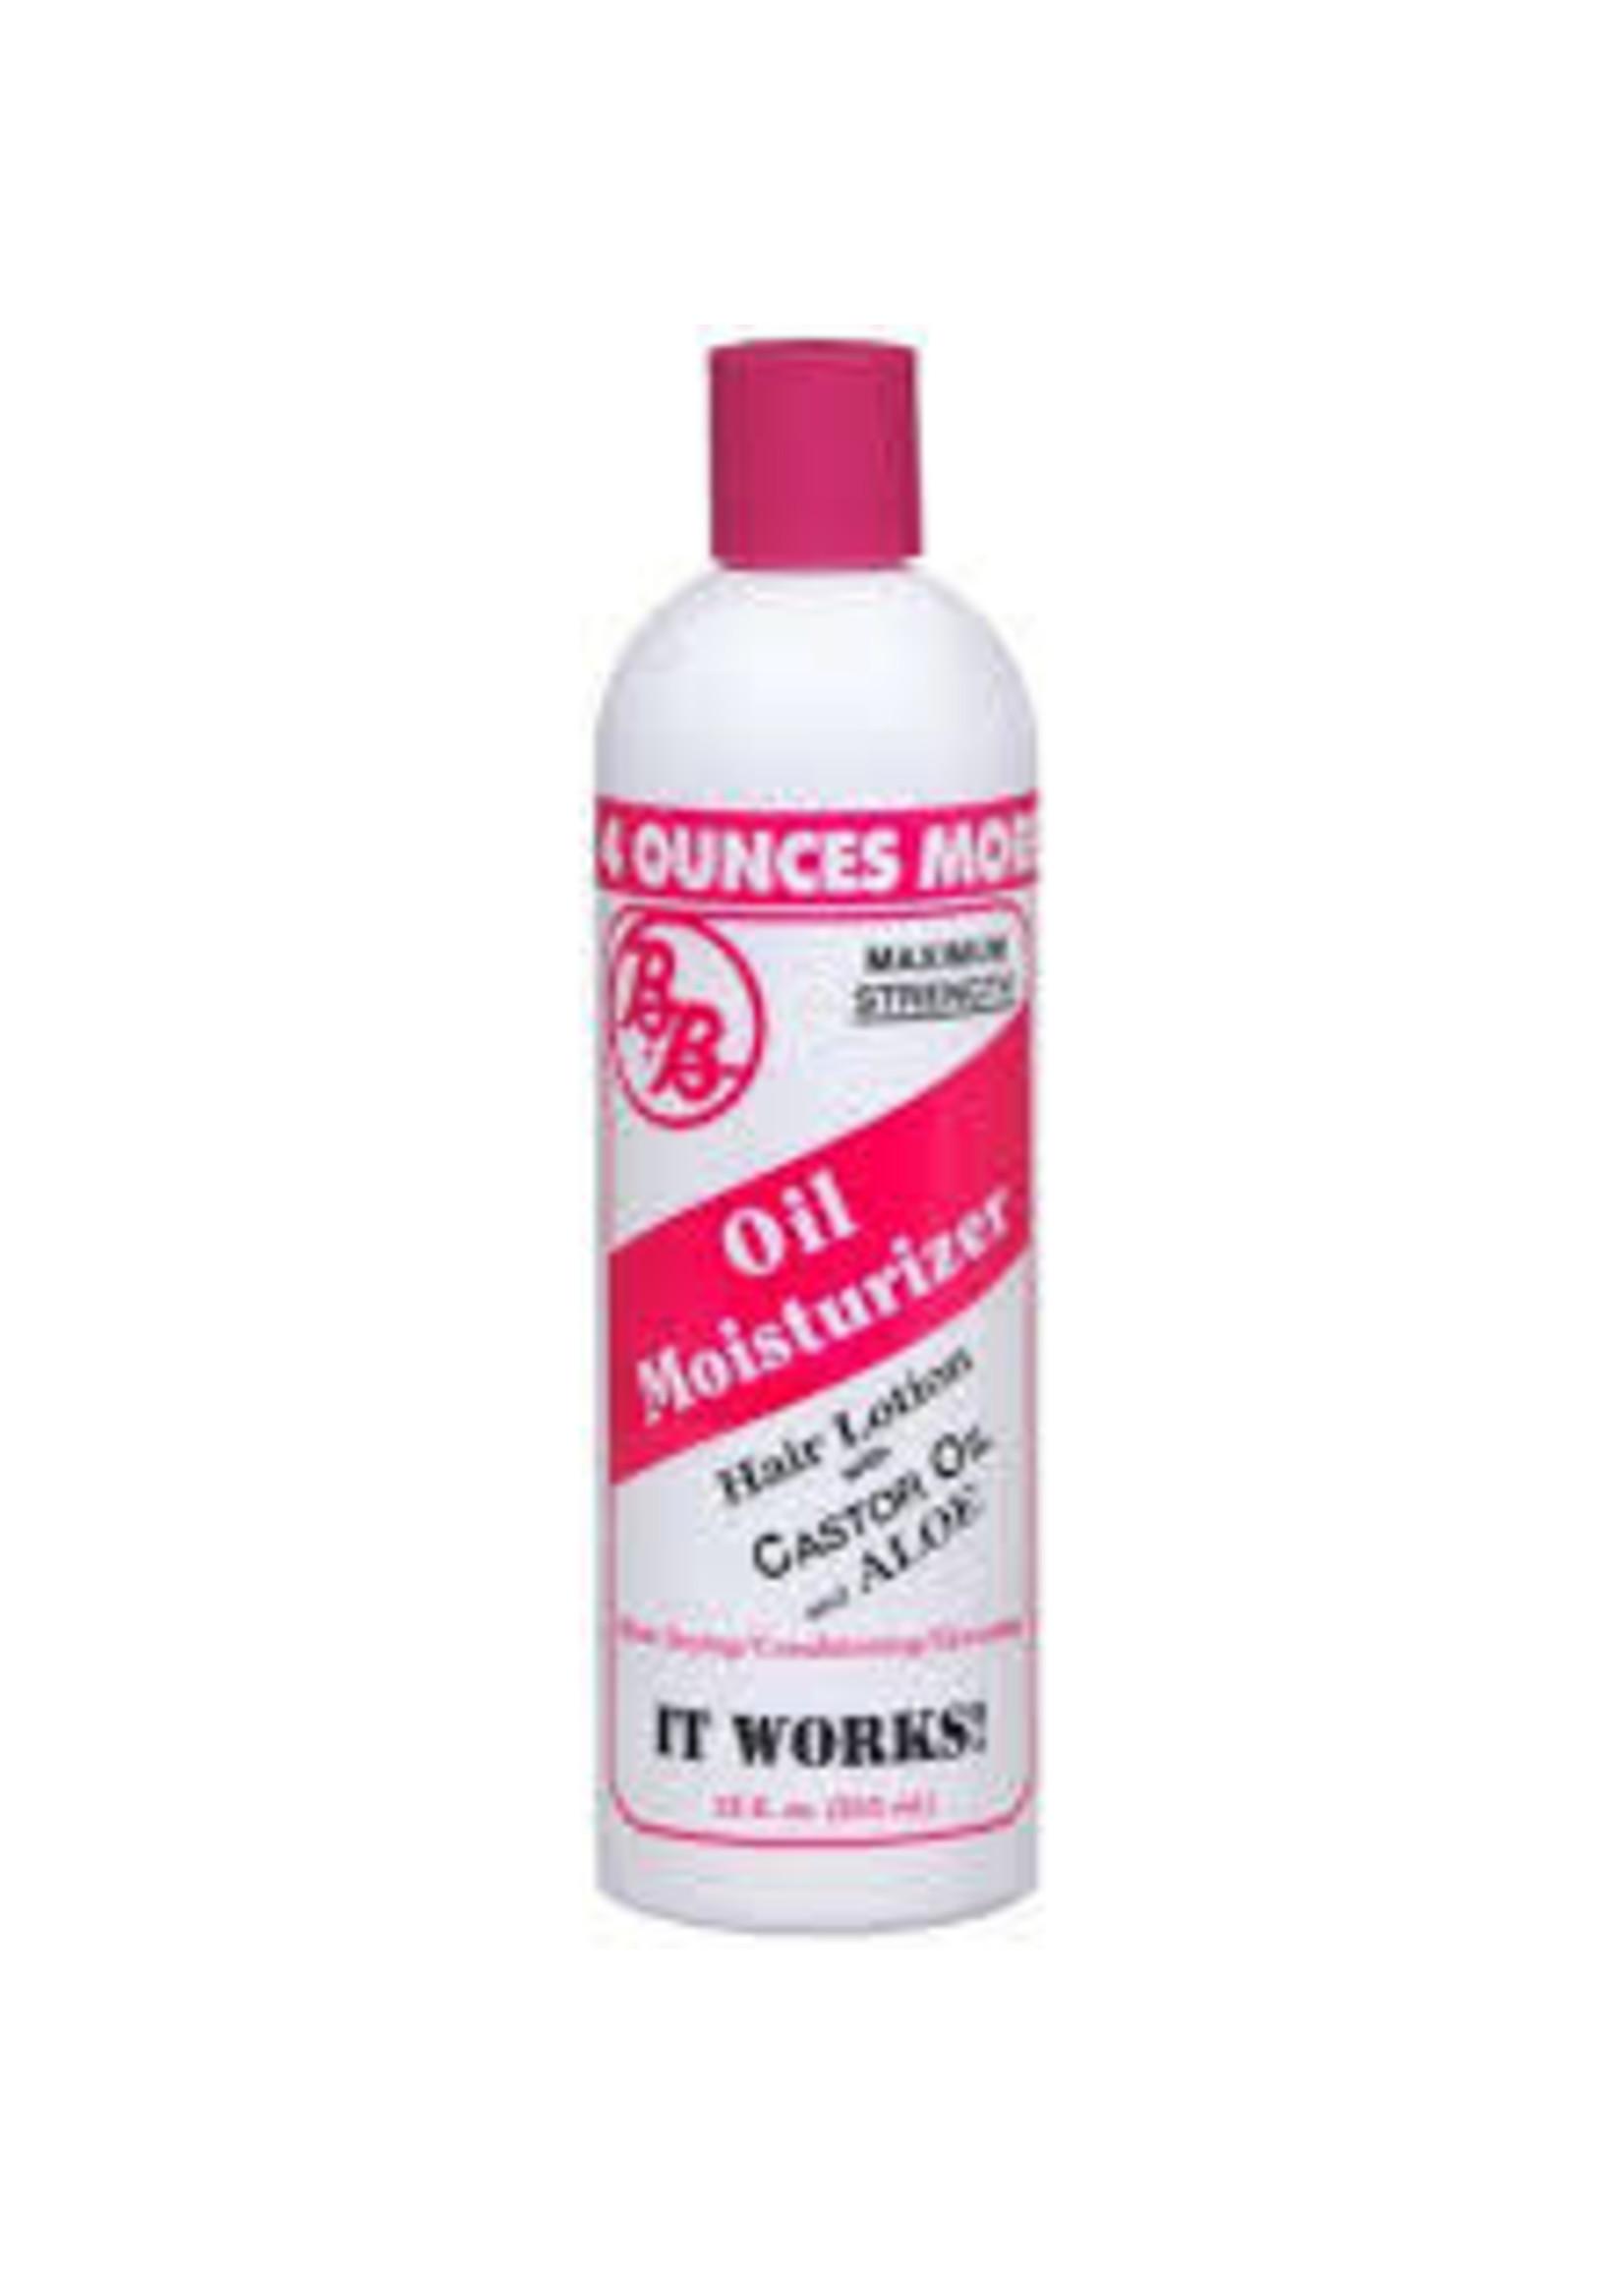 BB Oil Moisturizer Hair & Lotion w/Castor Oil